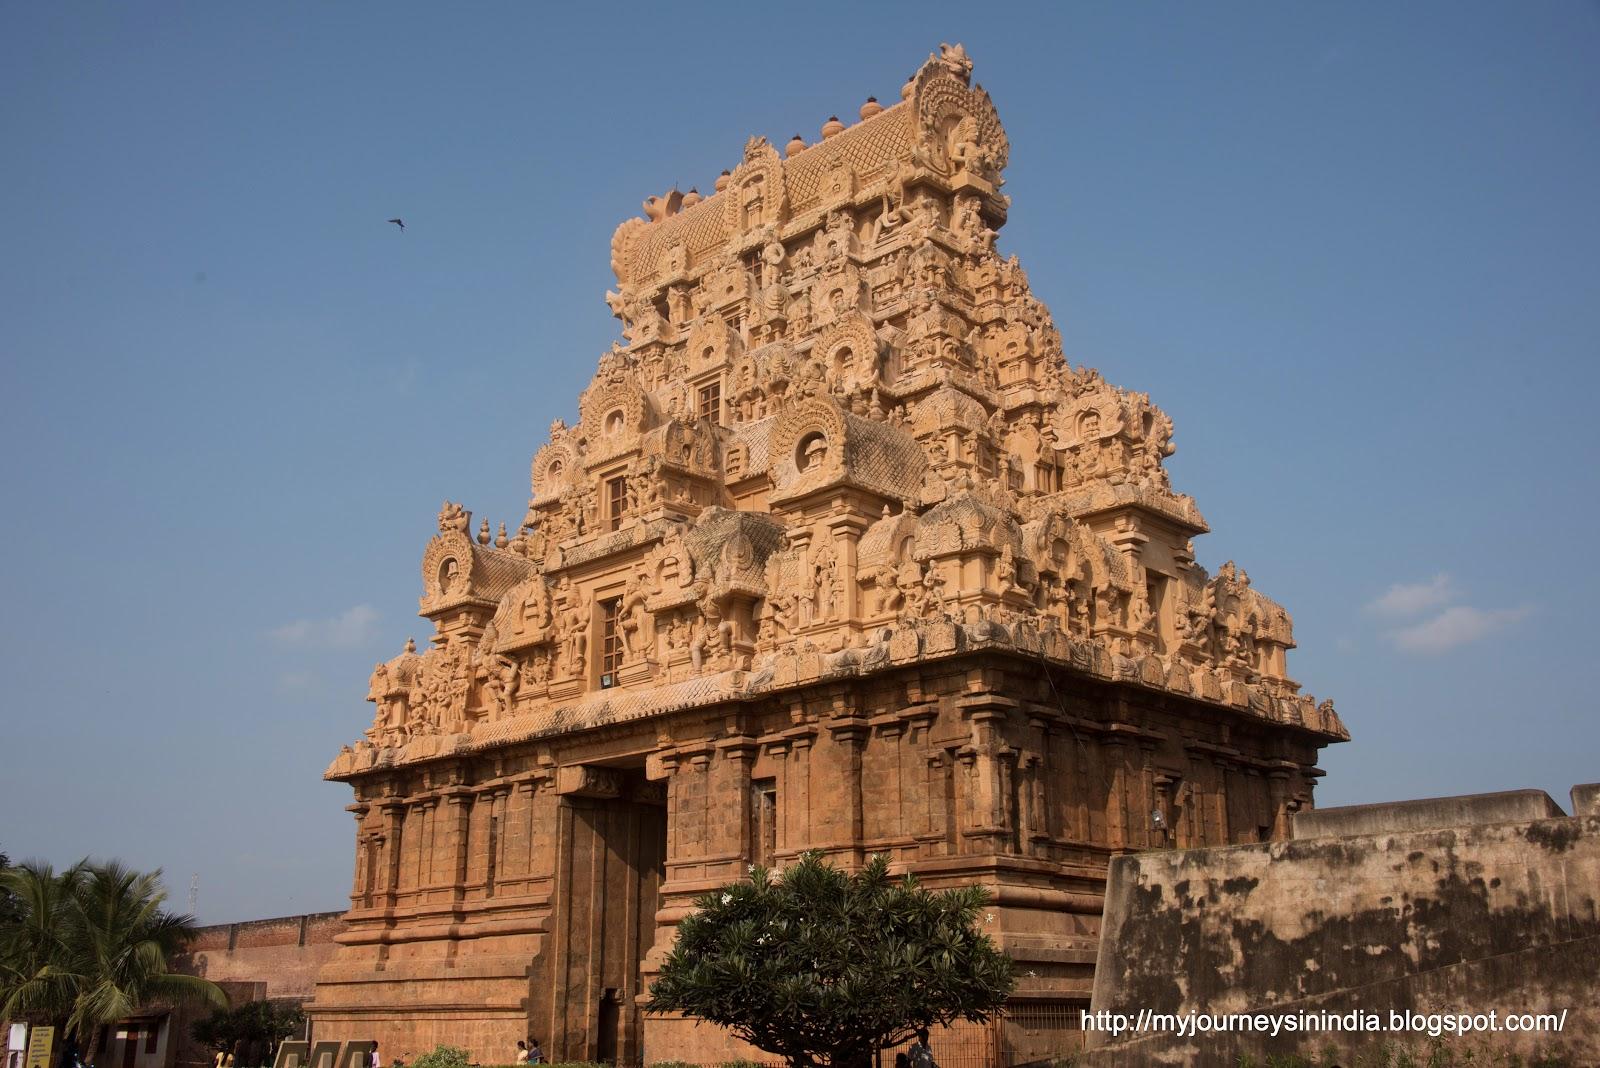 Thanjavur Brihadeeswarar Temple Entrance Tower